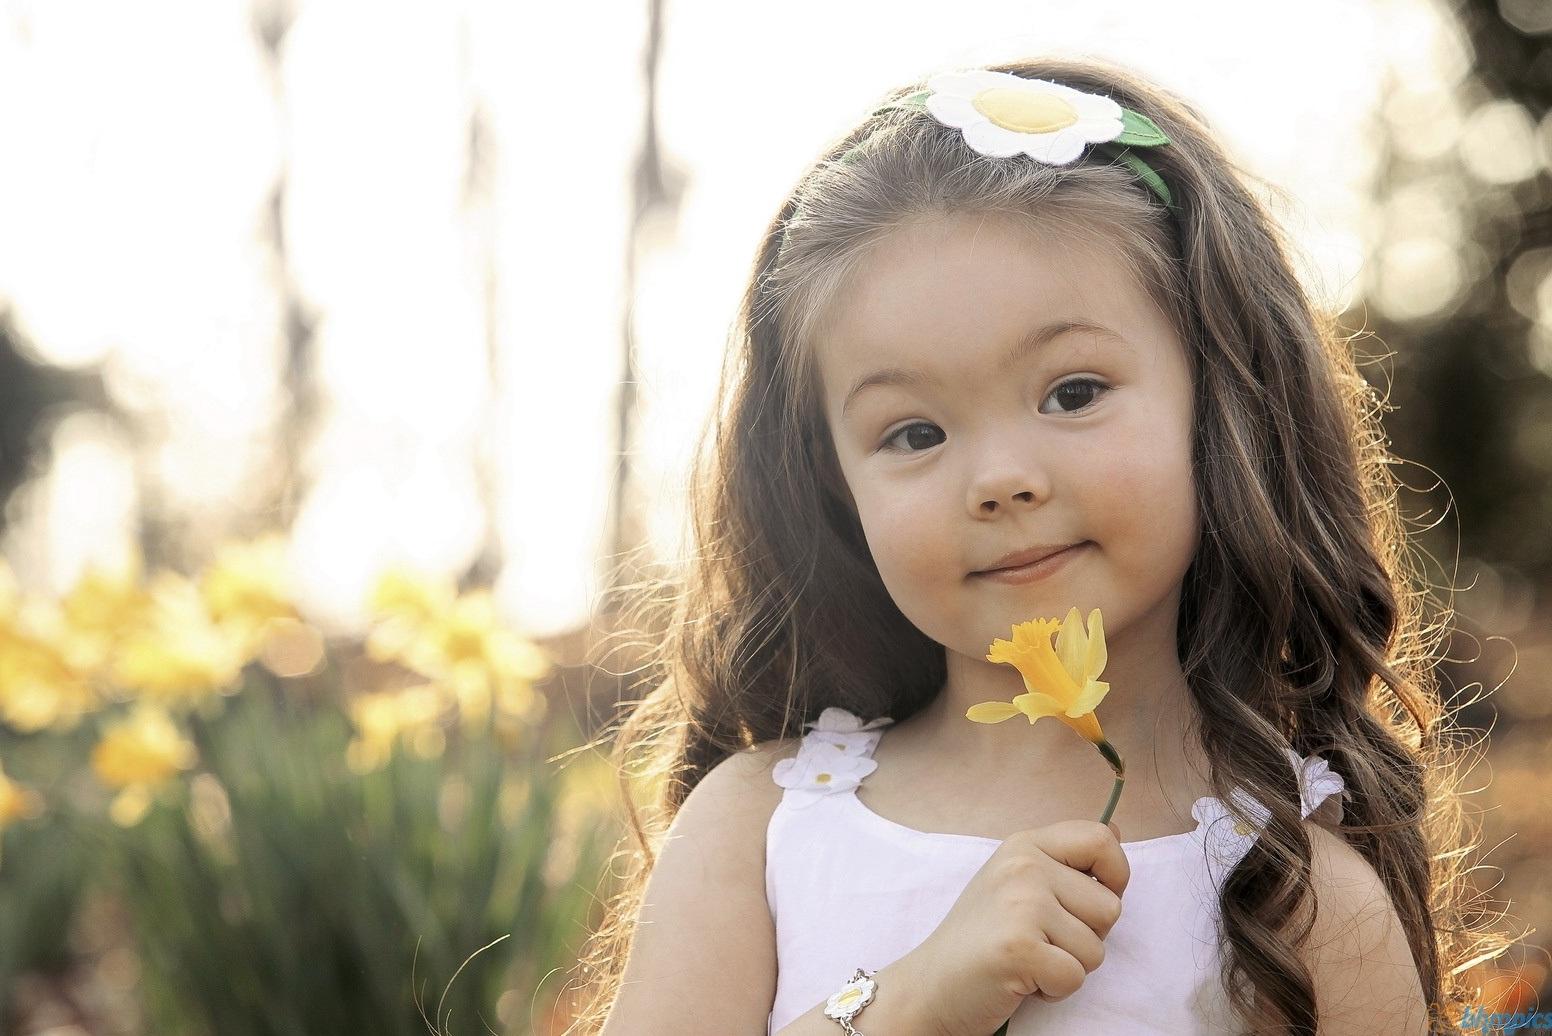 chinese_little_girl+photo+powerball+adop